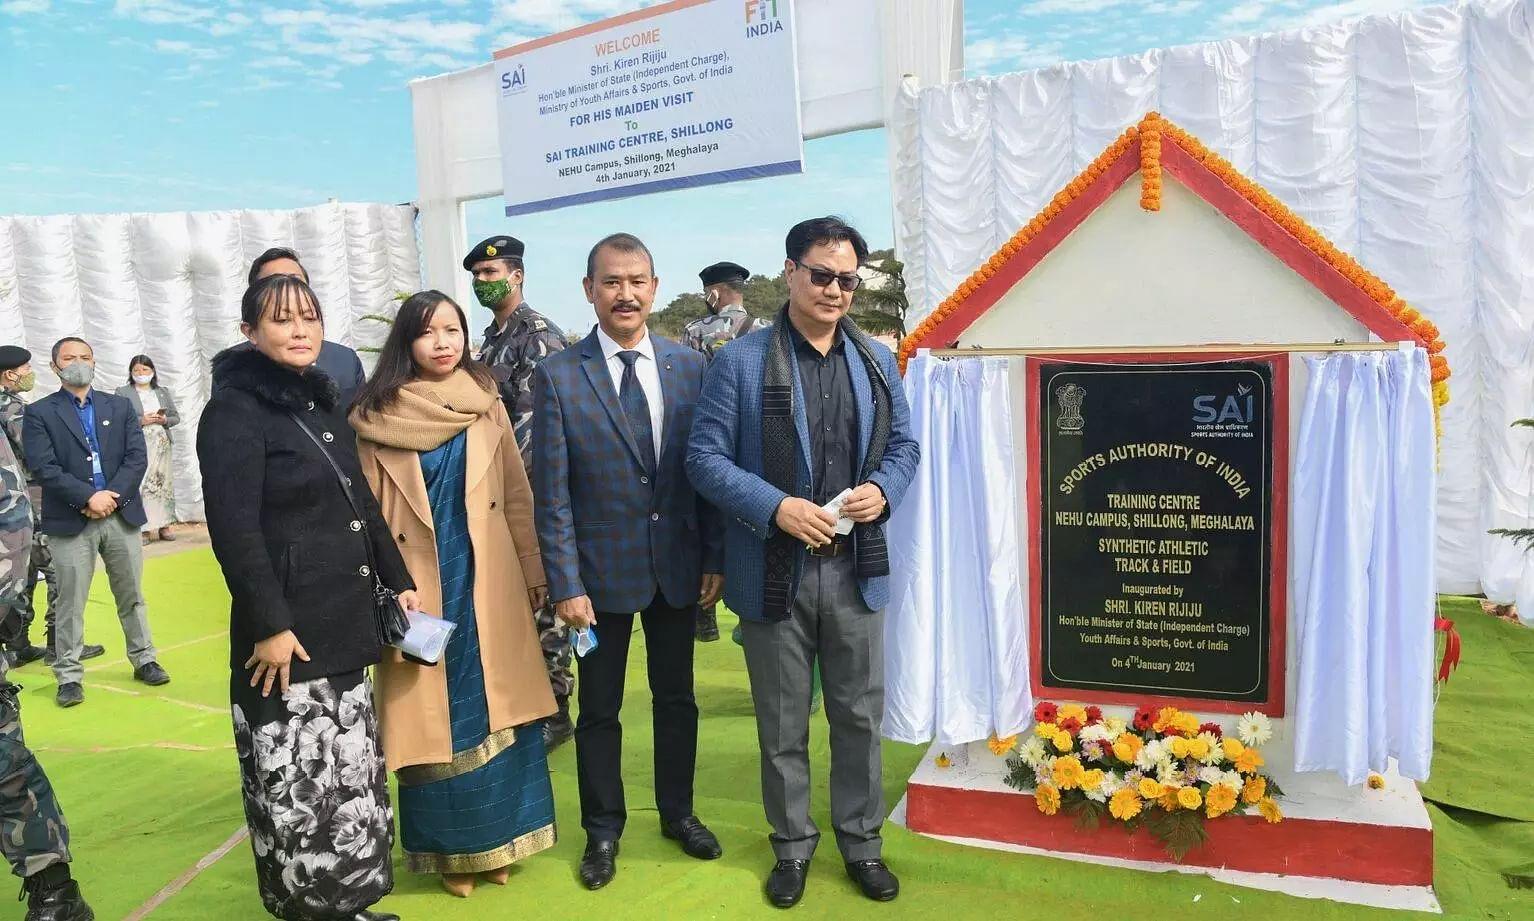 Union Minister Kiren Rijiju inaugurates Synthetic Football Ground in SAI, Shillong